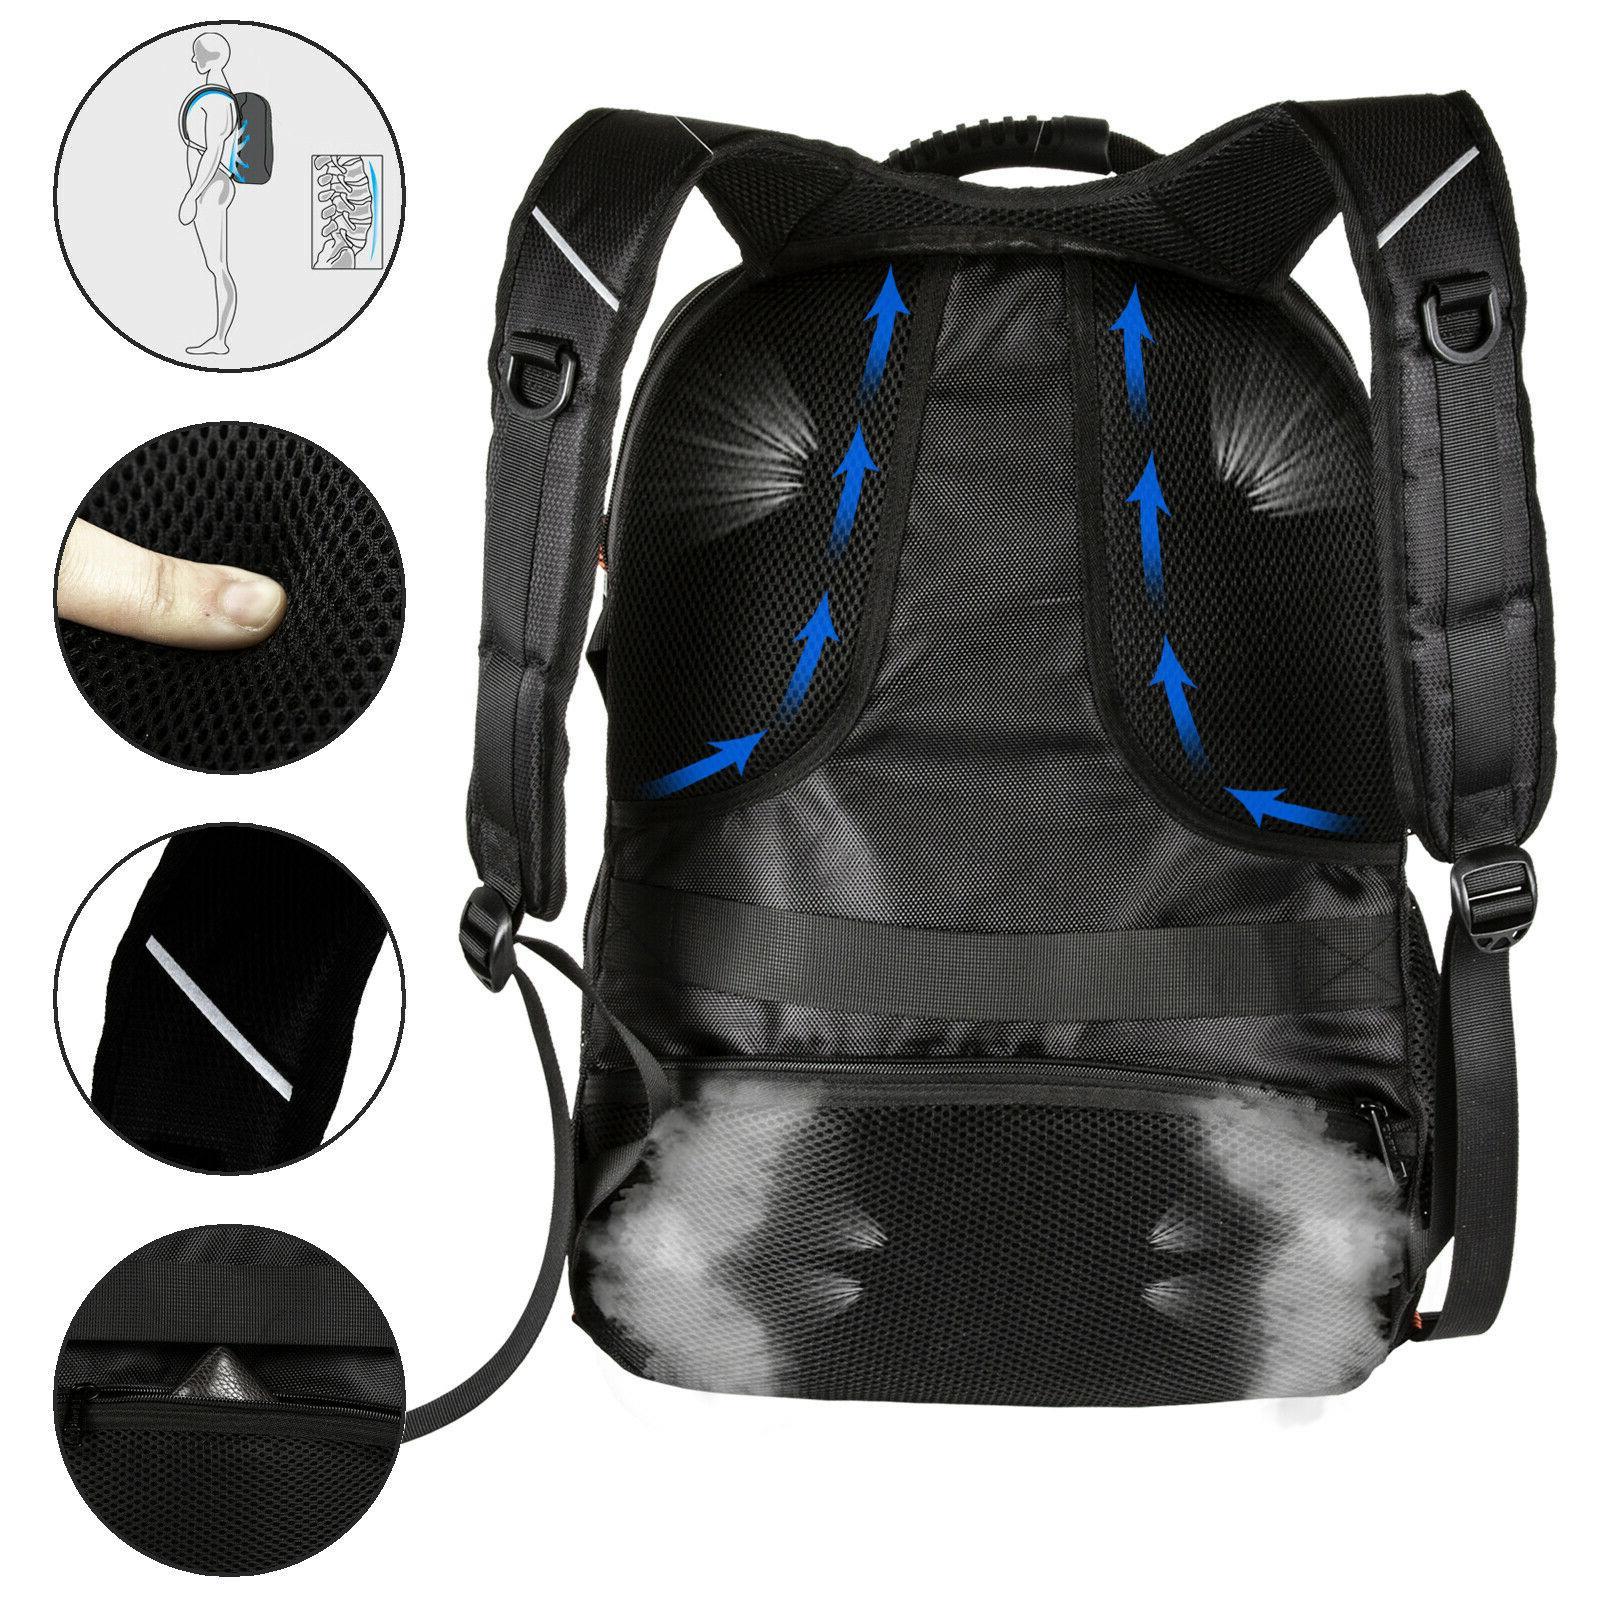 "Extra TSA Durable Backpack Anti-Theft 17"" Laptop"